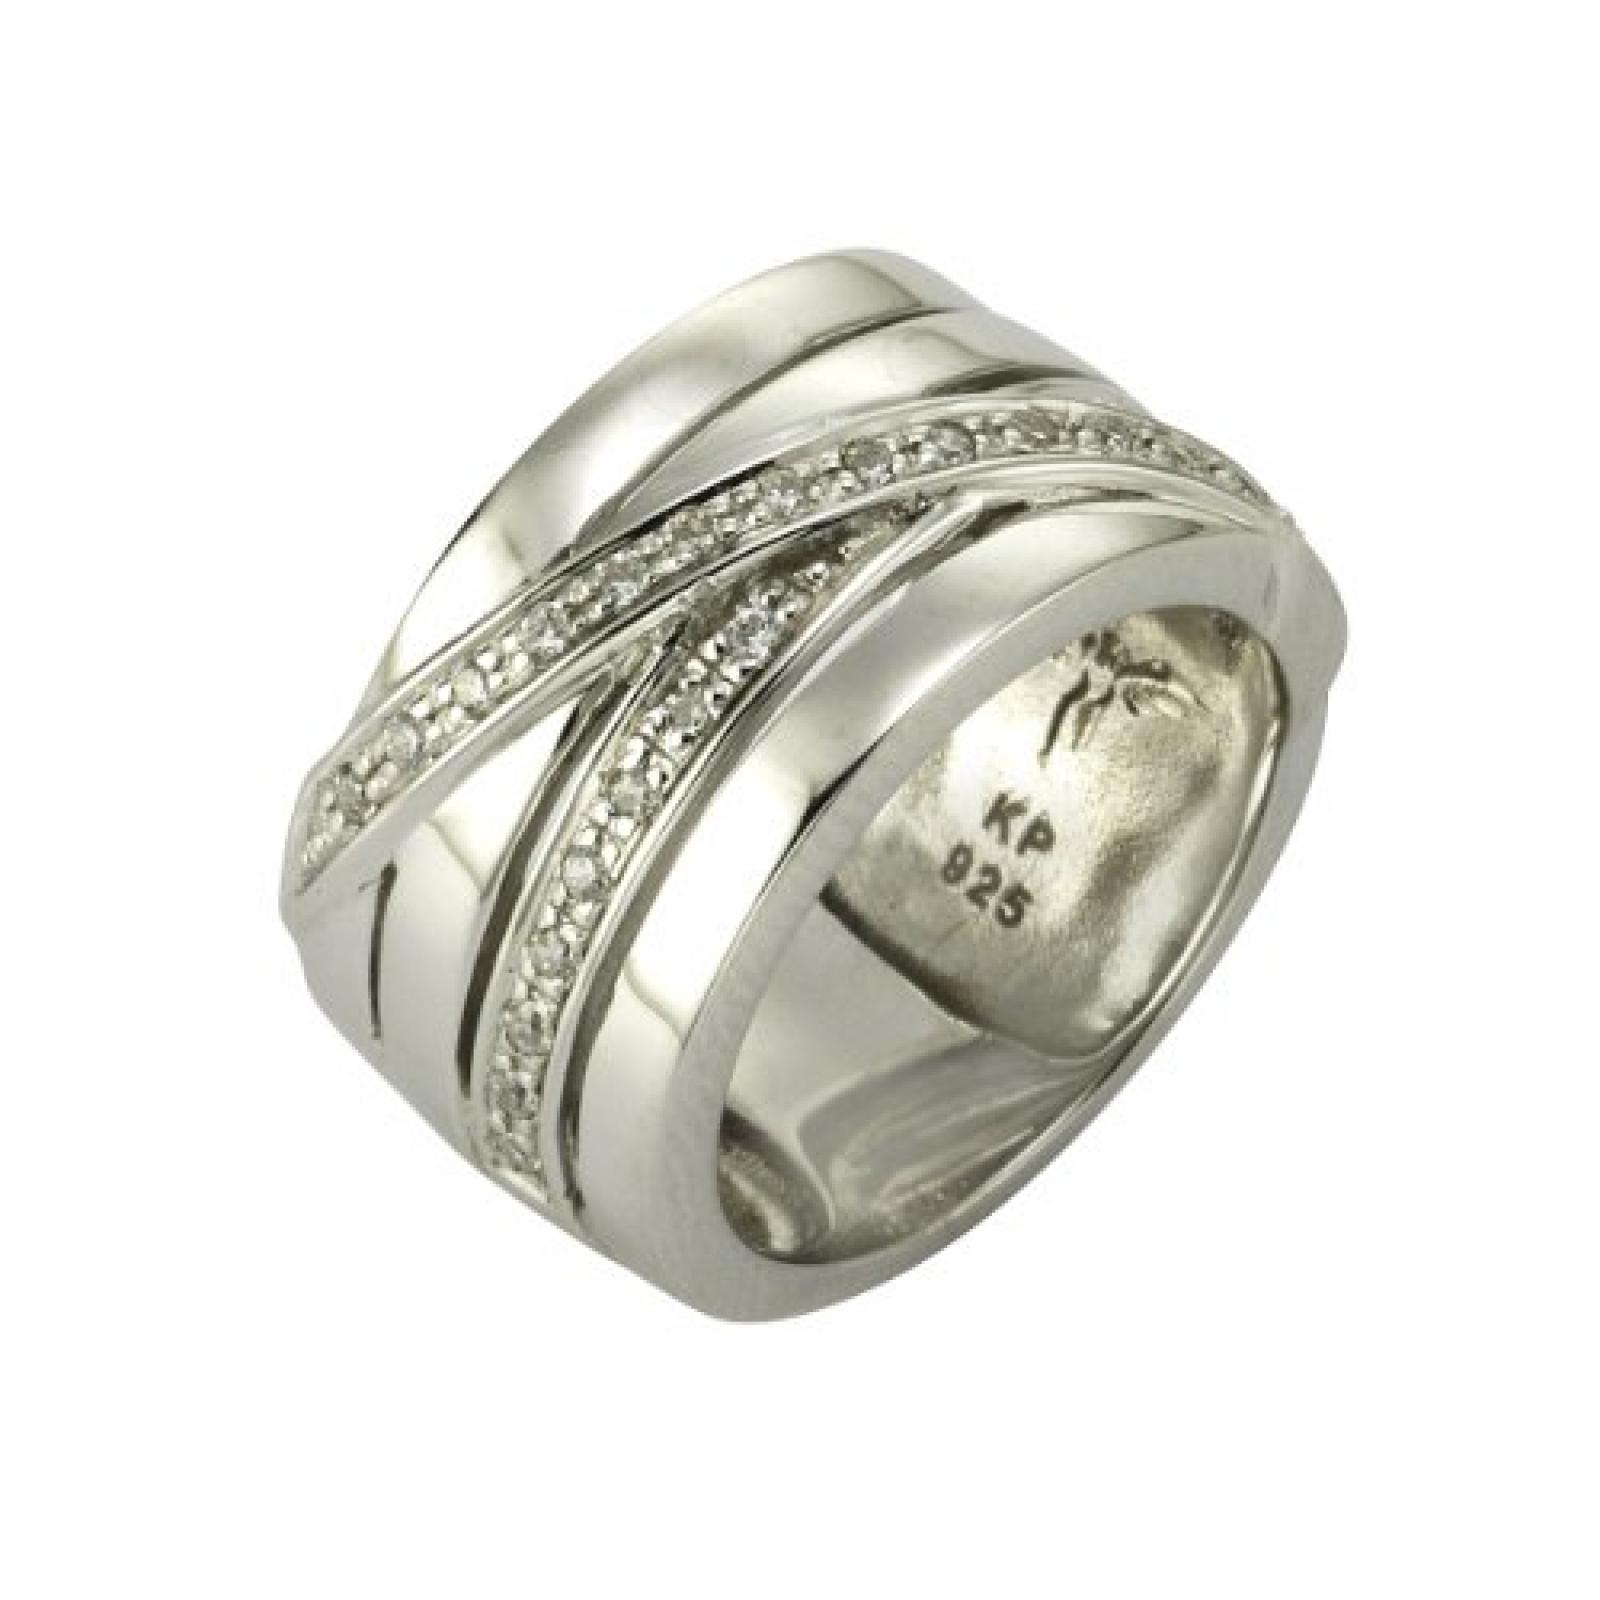 Celesta Damen-Ring 925 Sterling Silber Zirkonia weiß 60 (19.1) 273270870-019